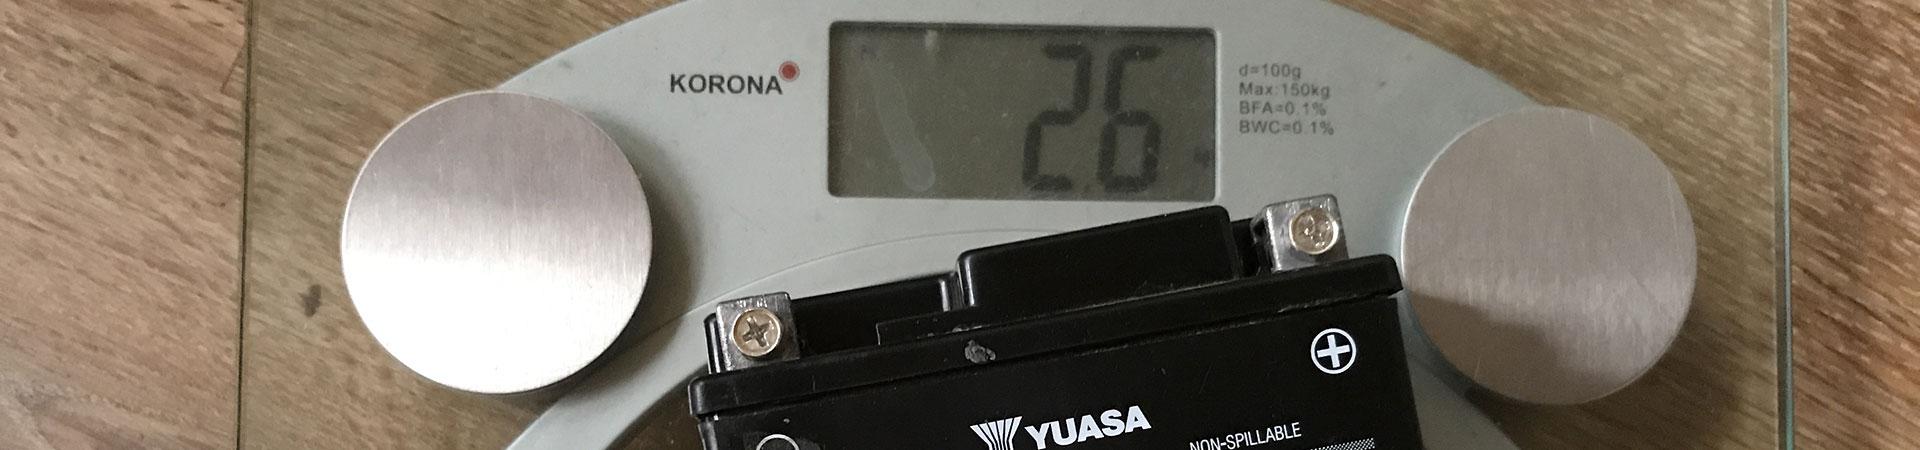 Tecno-Ion-Batterie